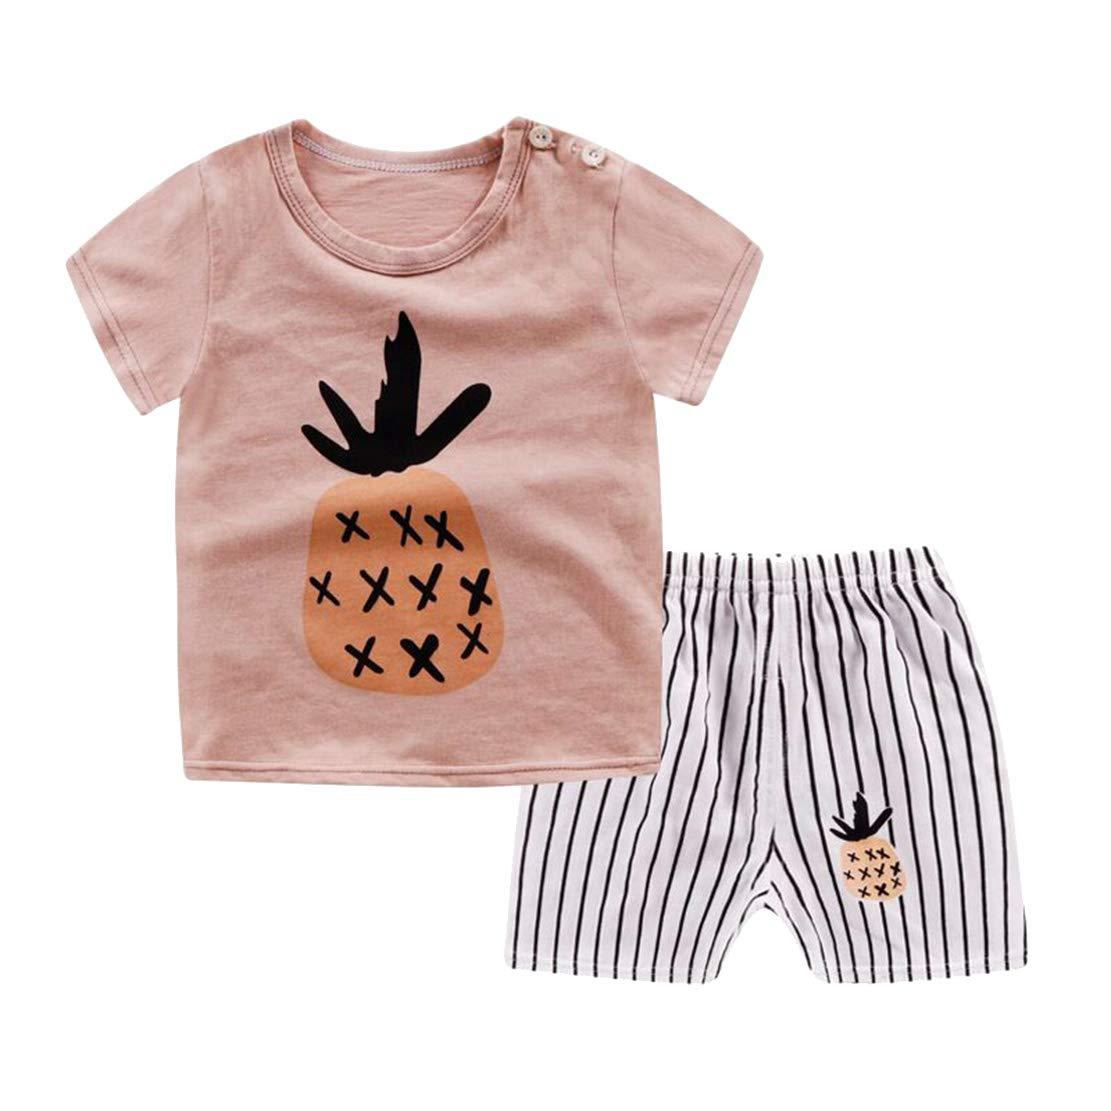 Pigiama Bimba Tutone Leggero 2 Pezzi T Shirt e Pantaloncino Bambino Manica Corta Cotone 100/% Animali Stampa Abbigliamento Estivo Sleepwear Bambini